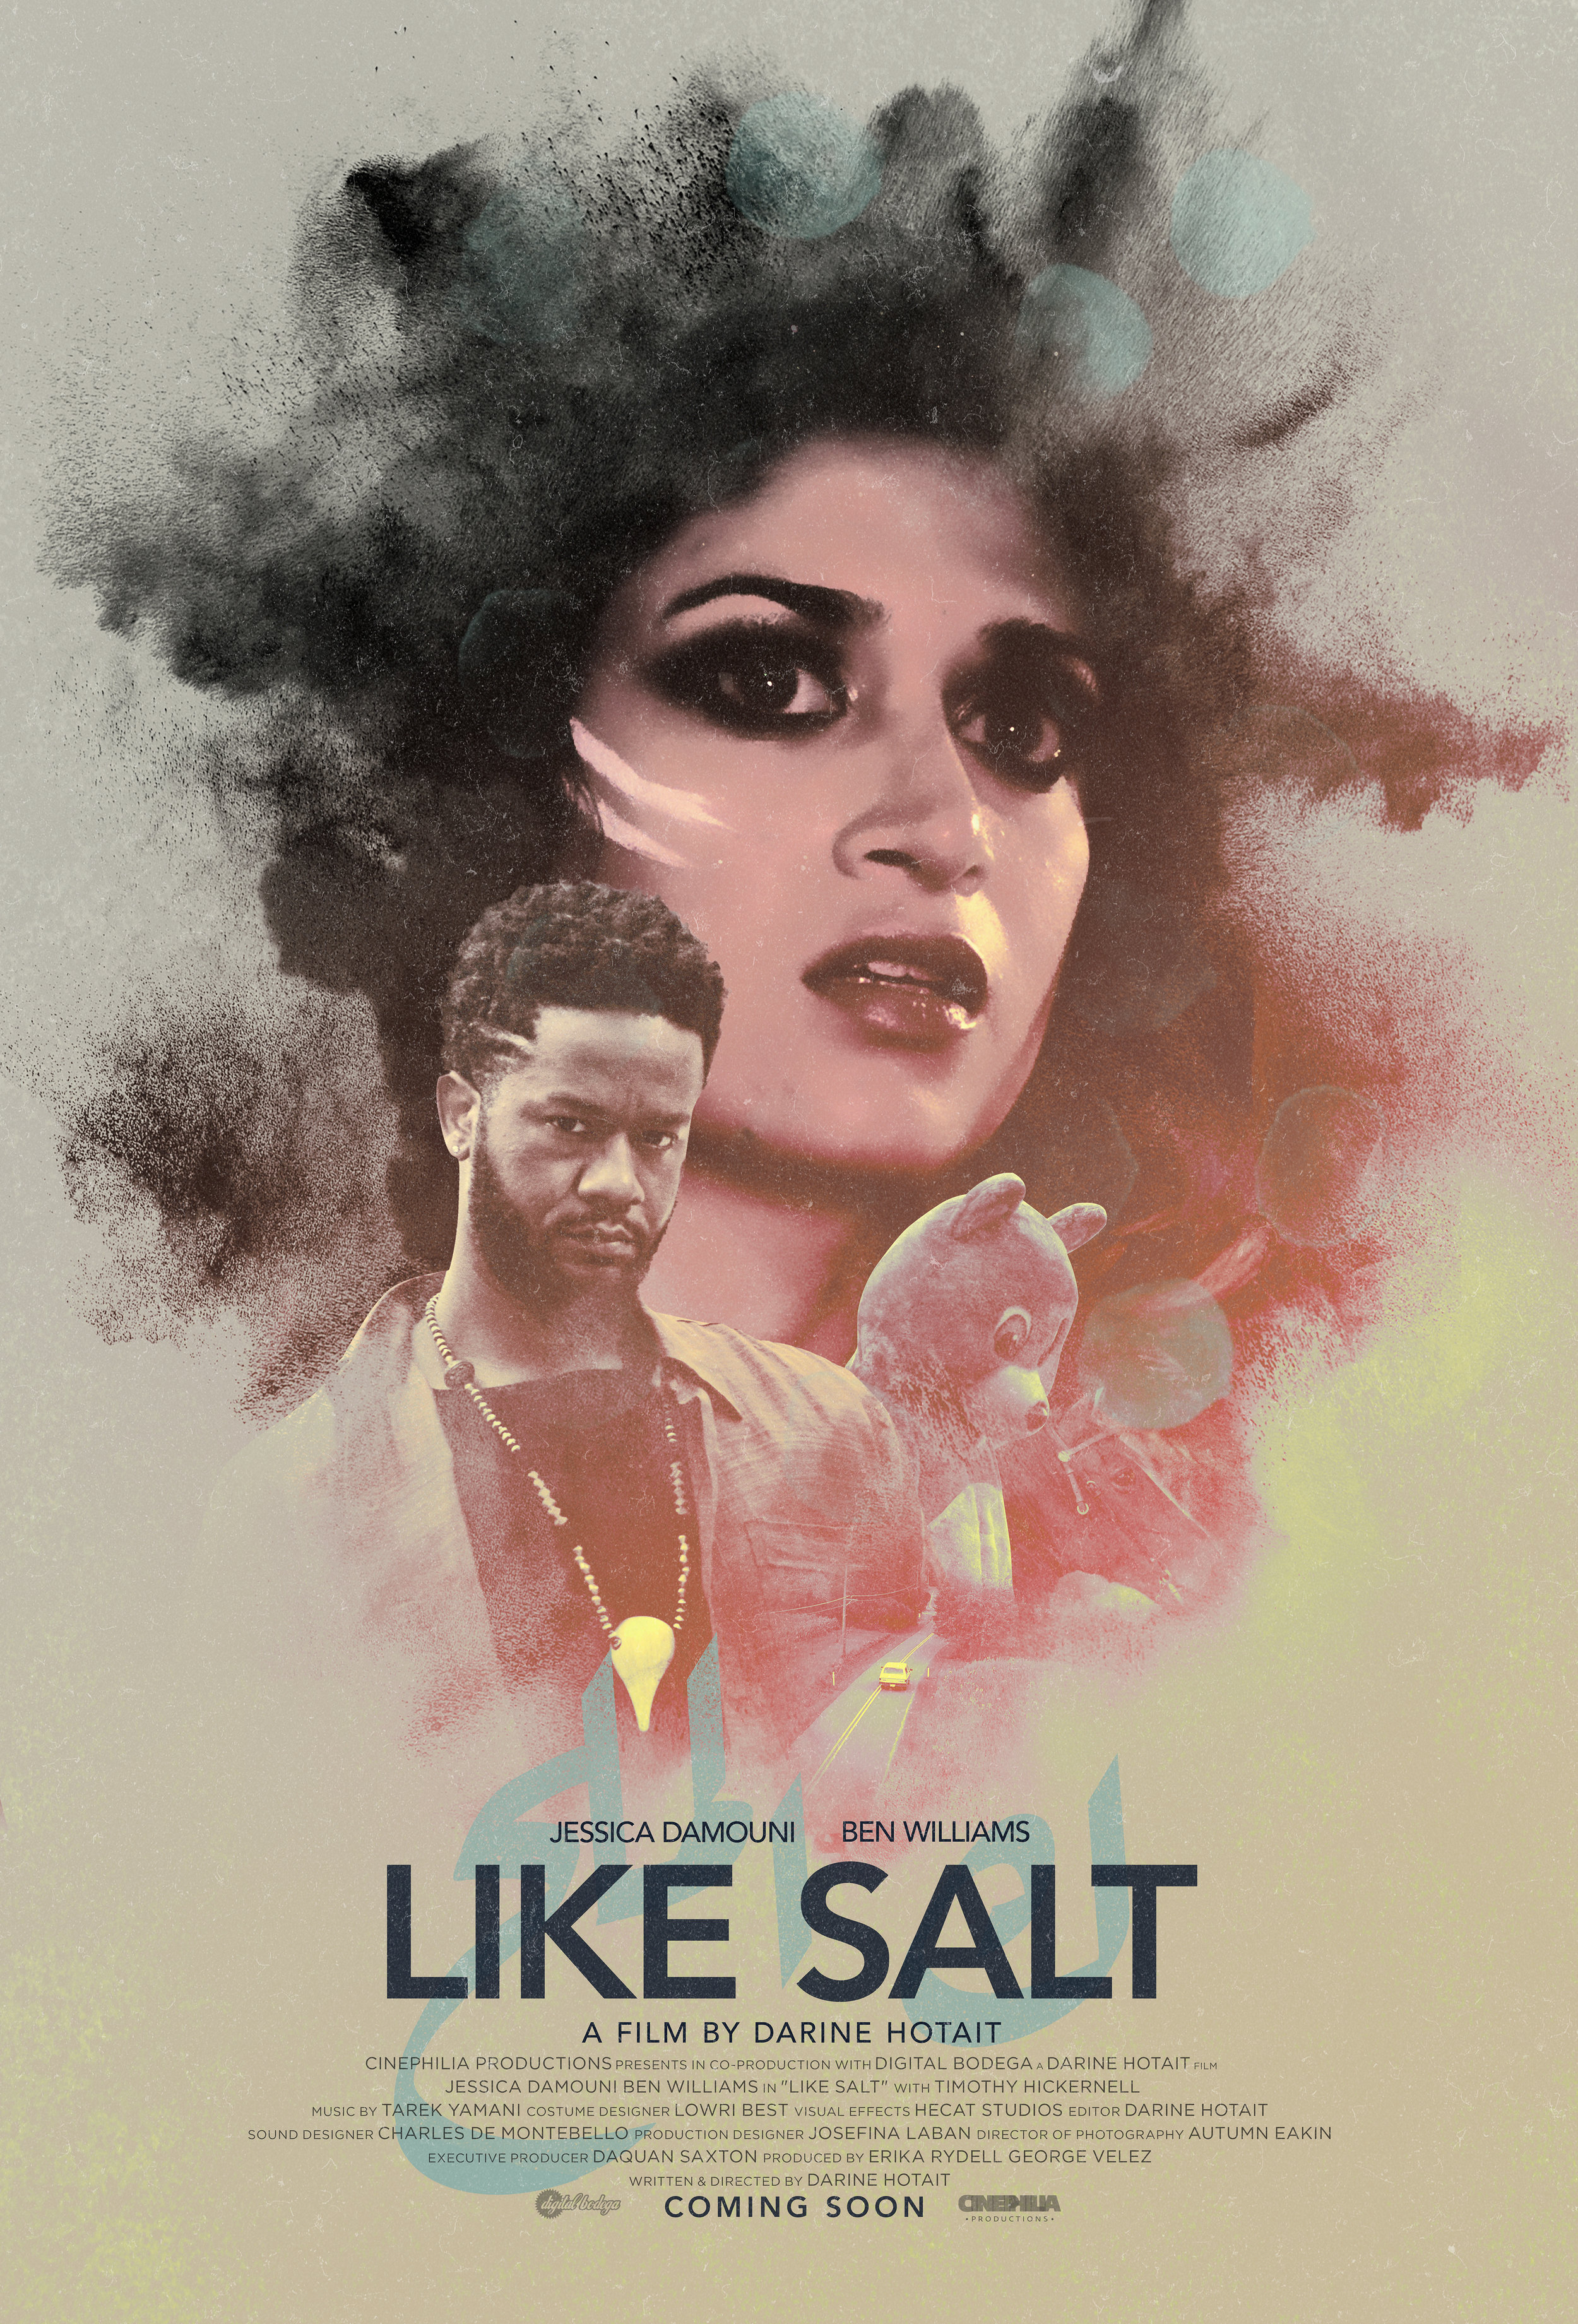 Like_Salt_Poster_13.5x20_sRGB_COMING_SOON.jpg